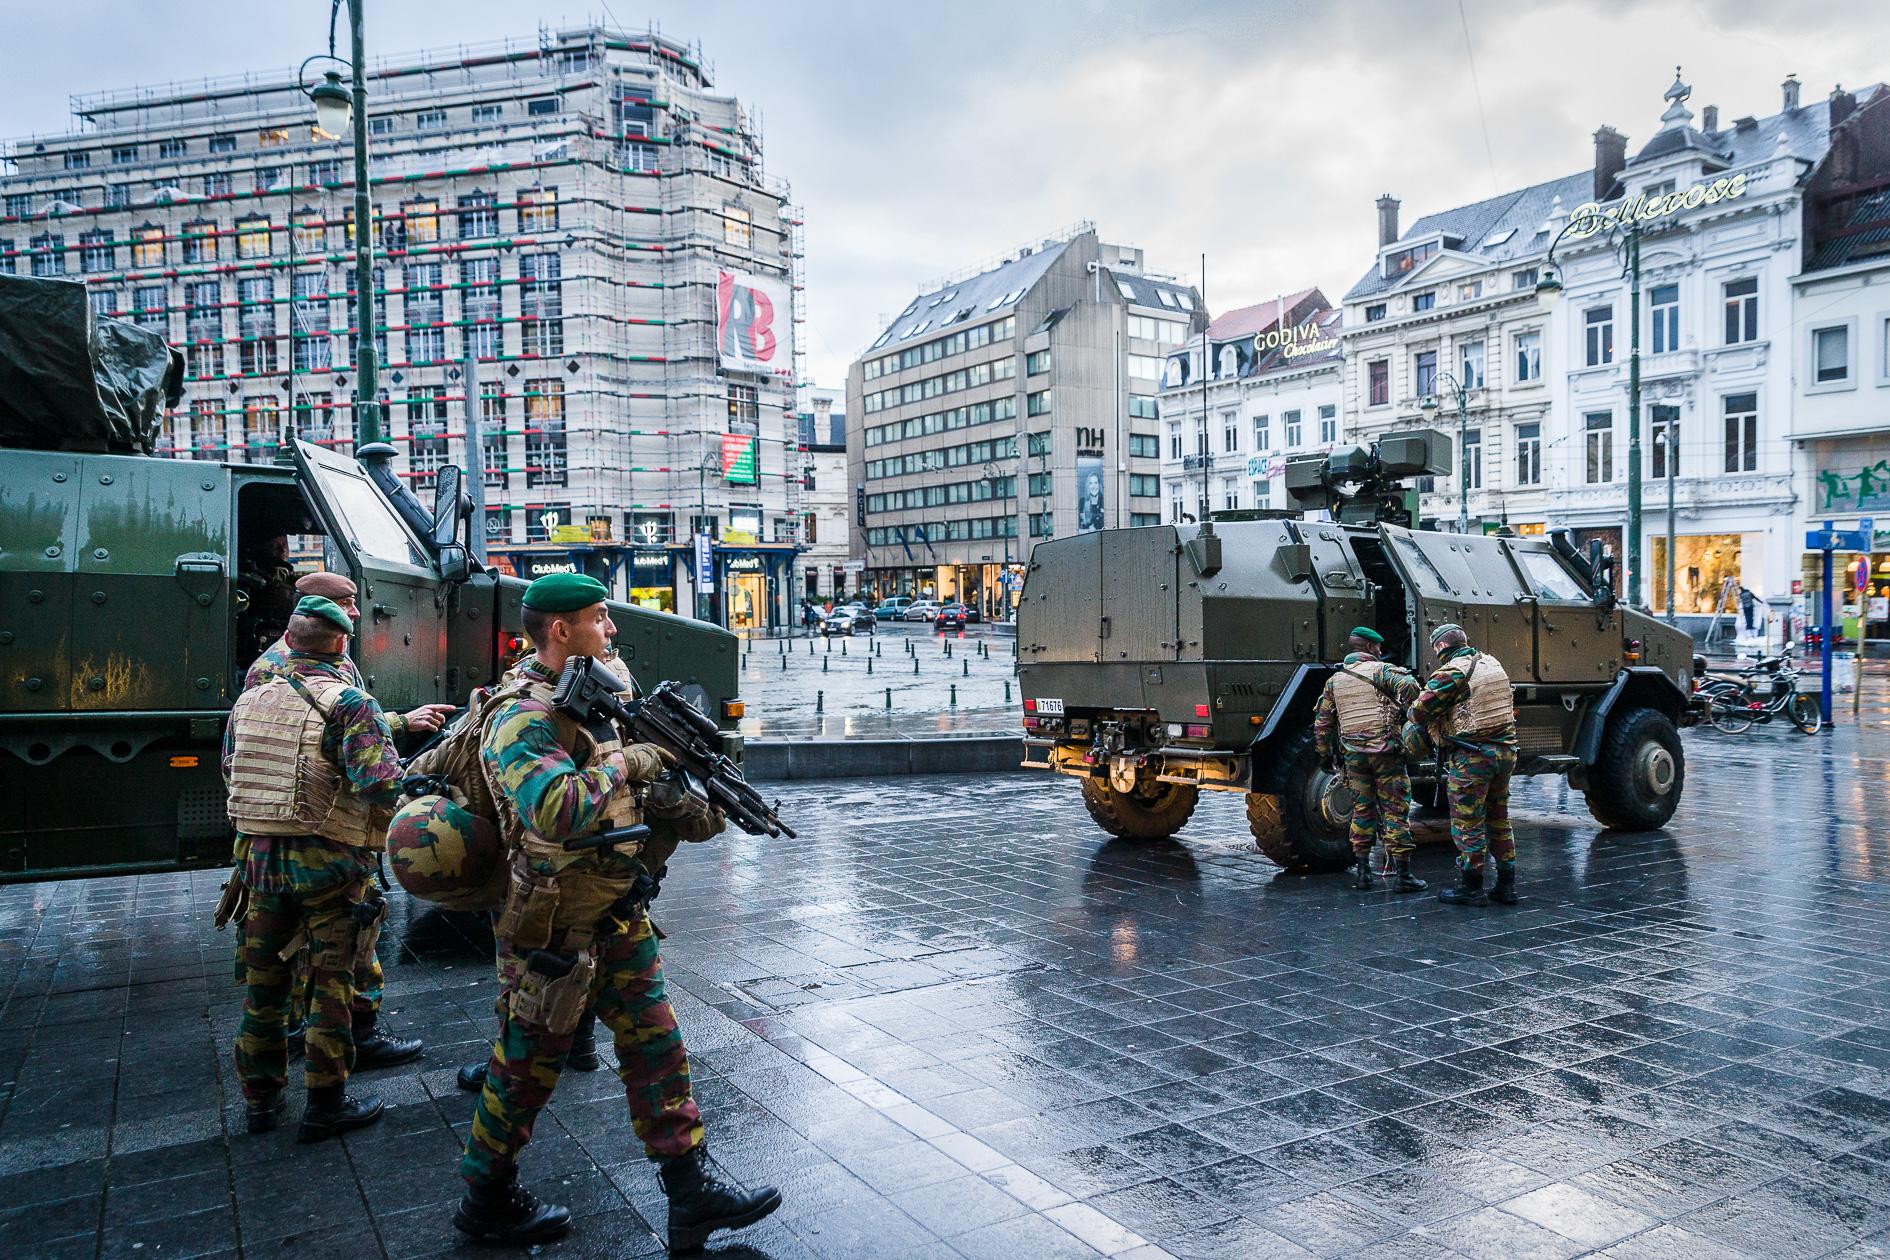 Terrorlevel IV in Brussels Louisalaan.